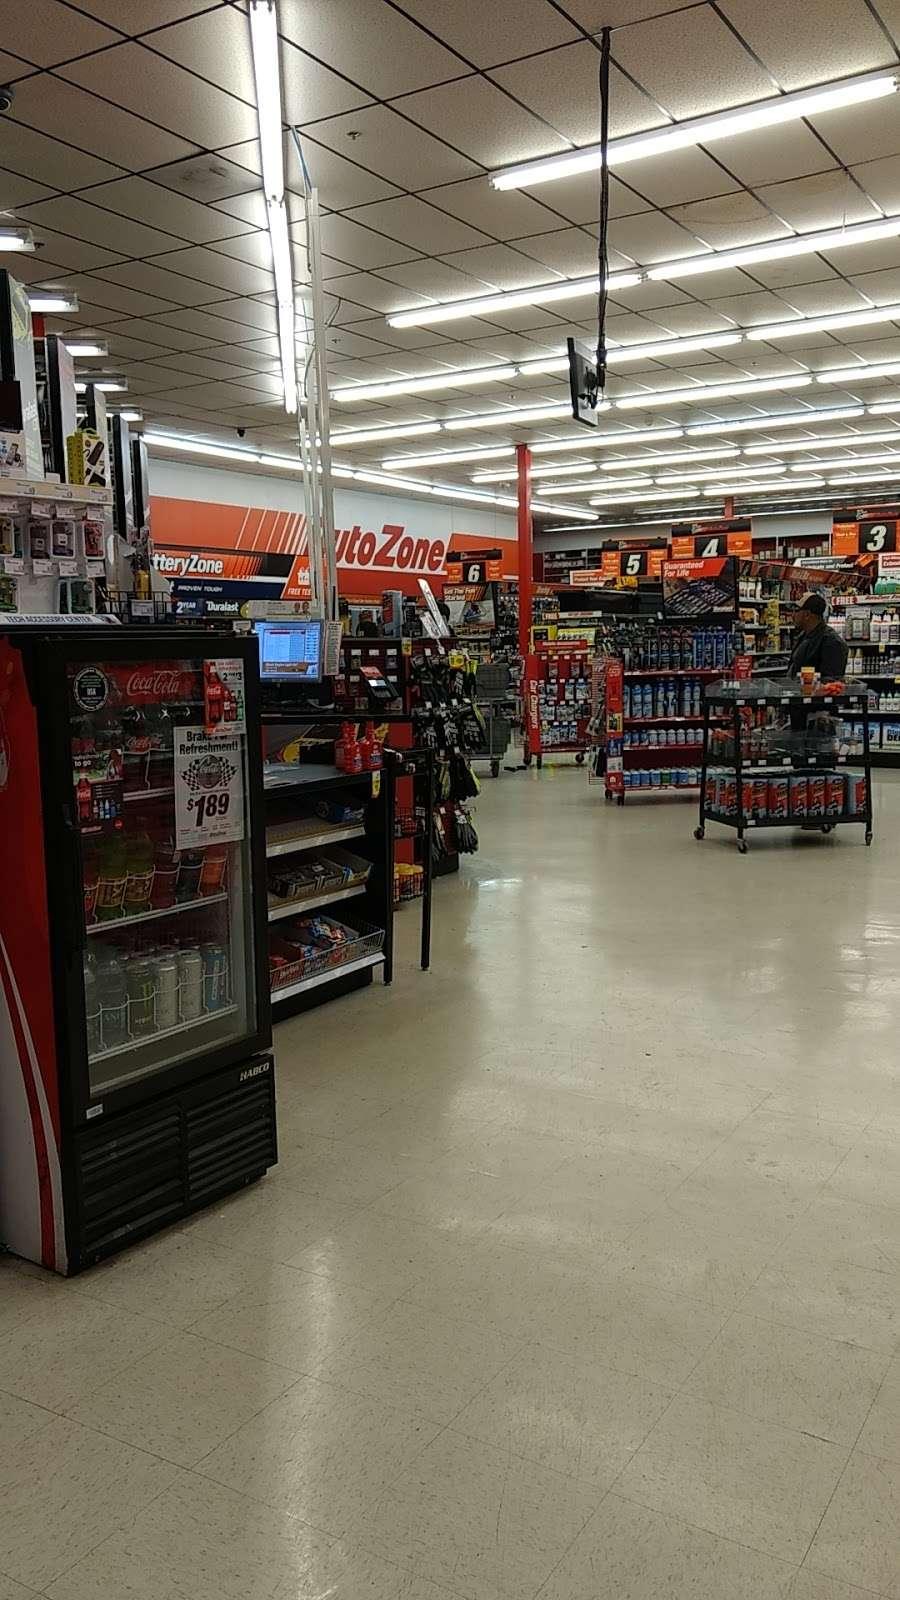 AutoZone Auto Parts - car repair  | Photo 1 of 10 | Address: 11104 Fondren Rd, Houston, TX 77096, USA | Phone: (713) 541-0495